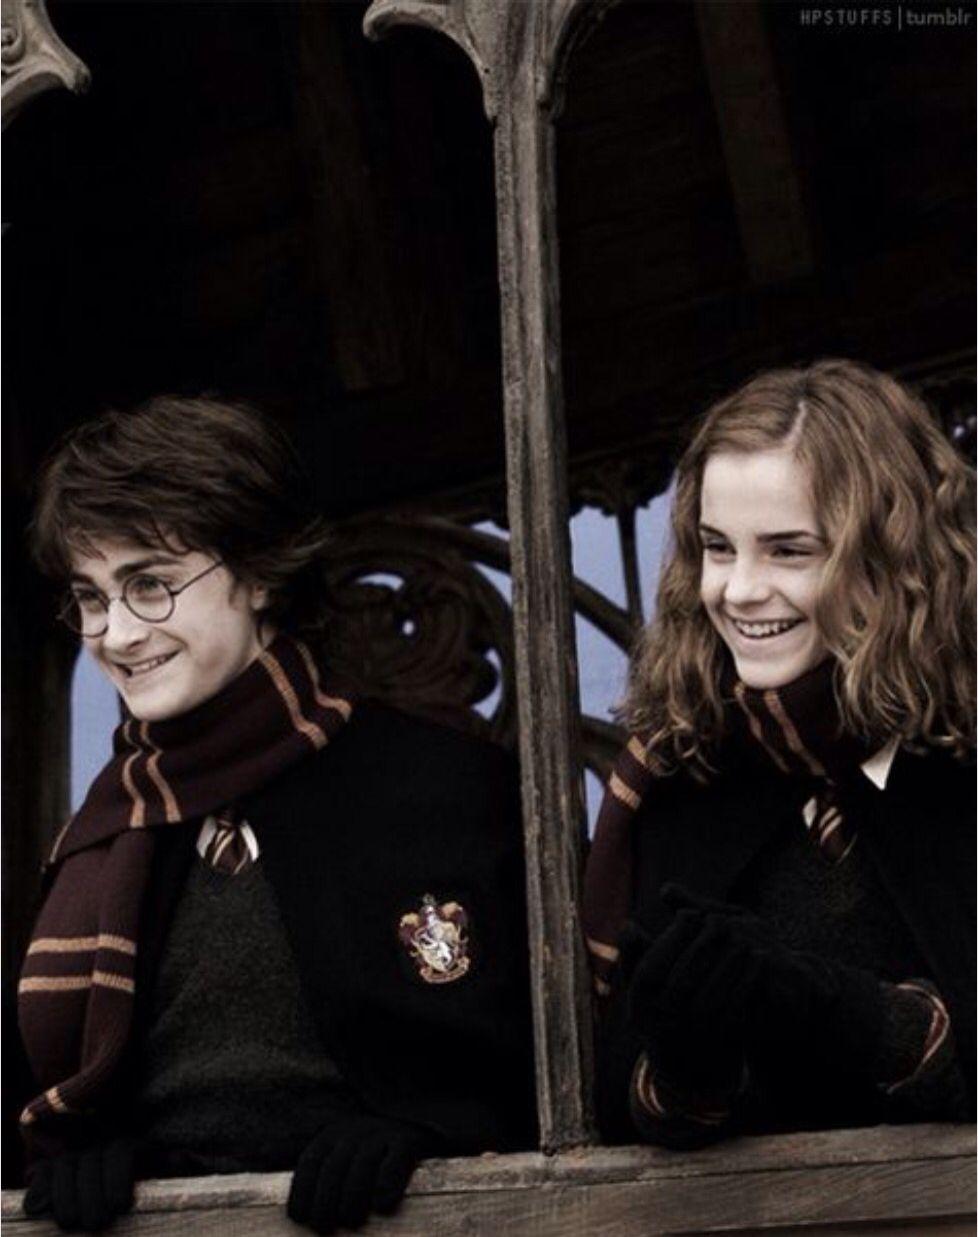 Harry Potter et Hermione Granger <3